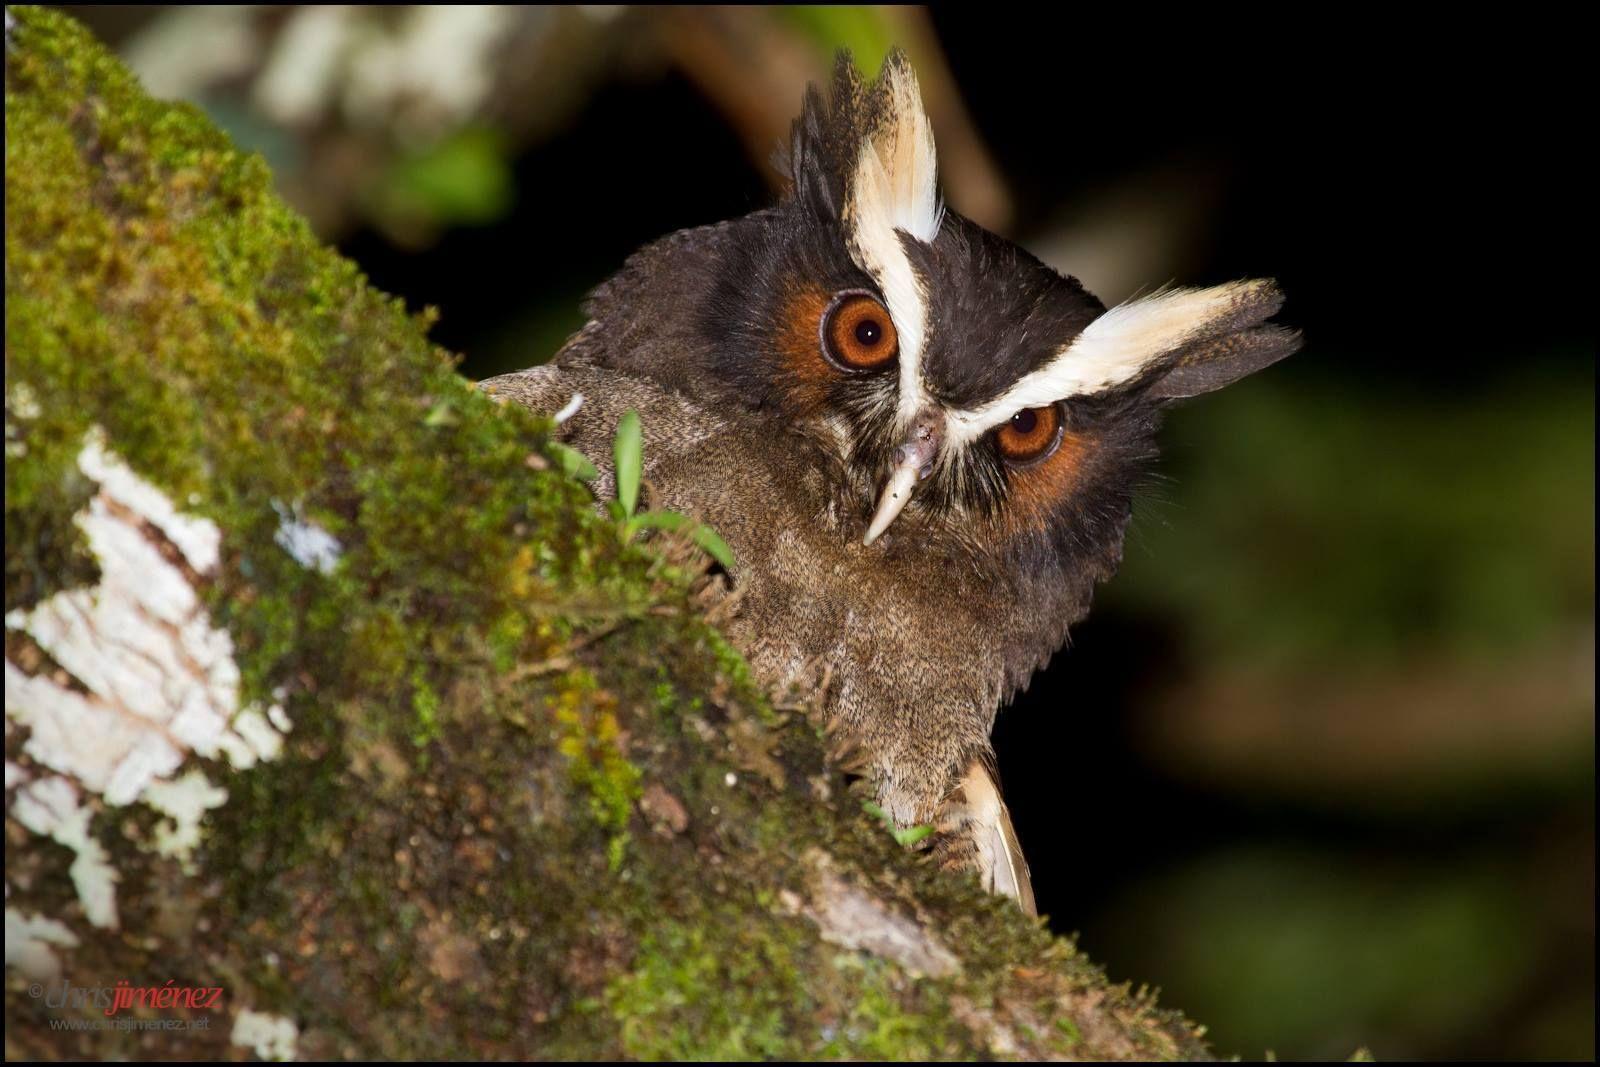 Crested Owl (Lophostrix cristata) by Chris Jimenez